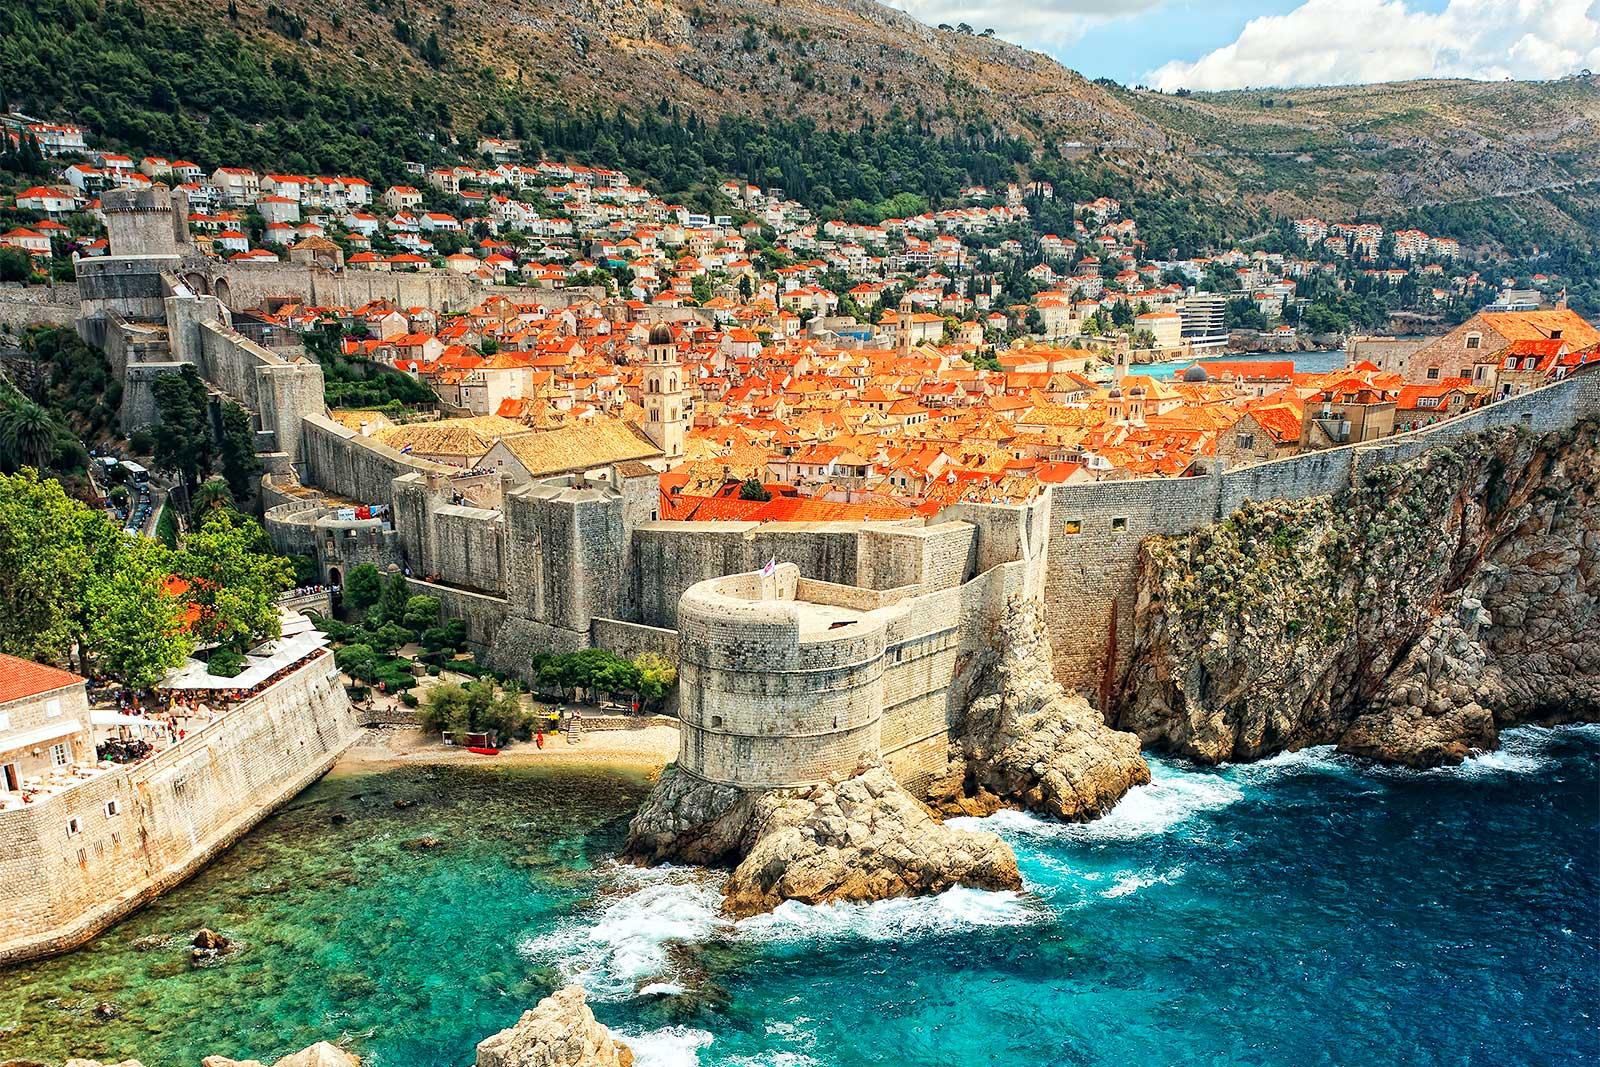 Dubrovnik Old Town - Croatia